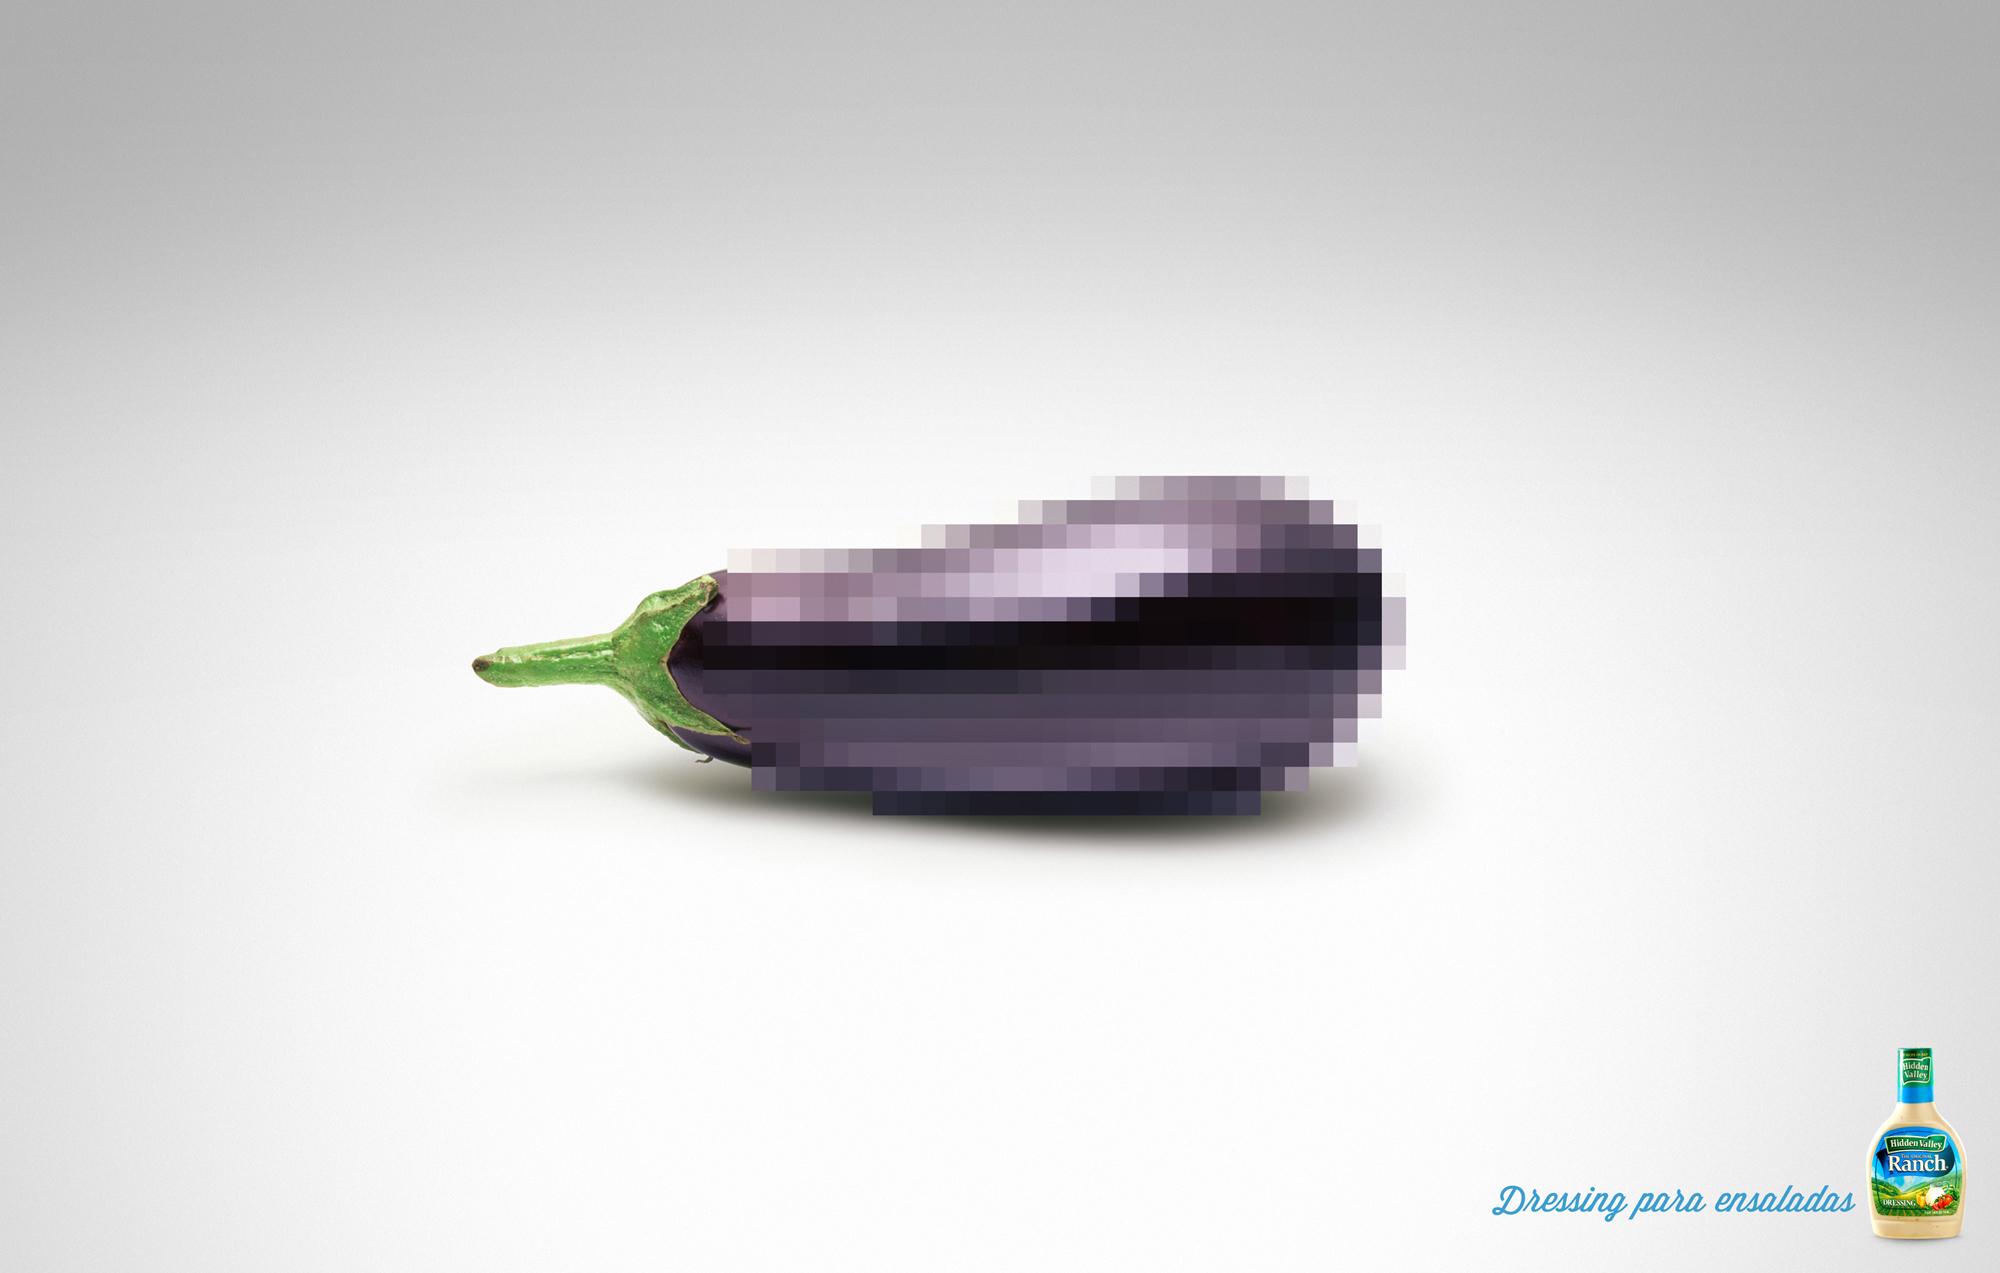 HiddenRanch_DressIt_Eggplant.jpg